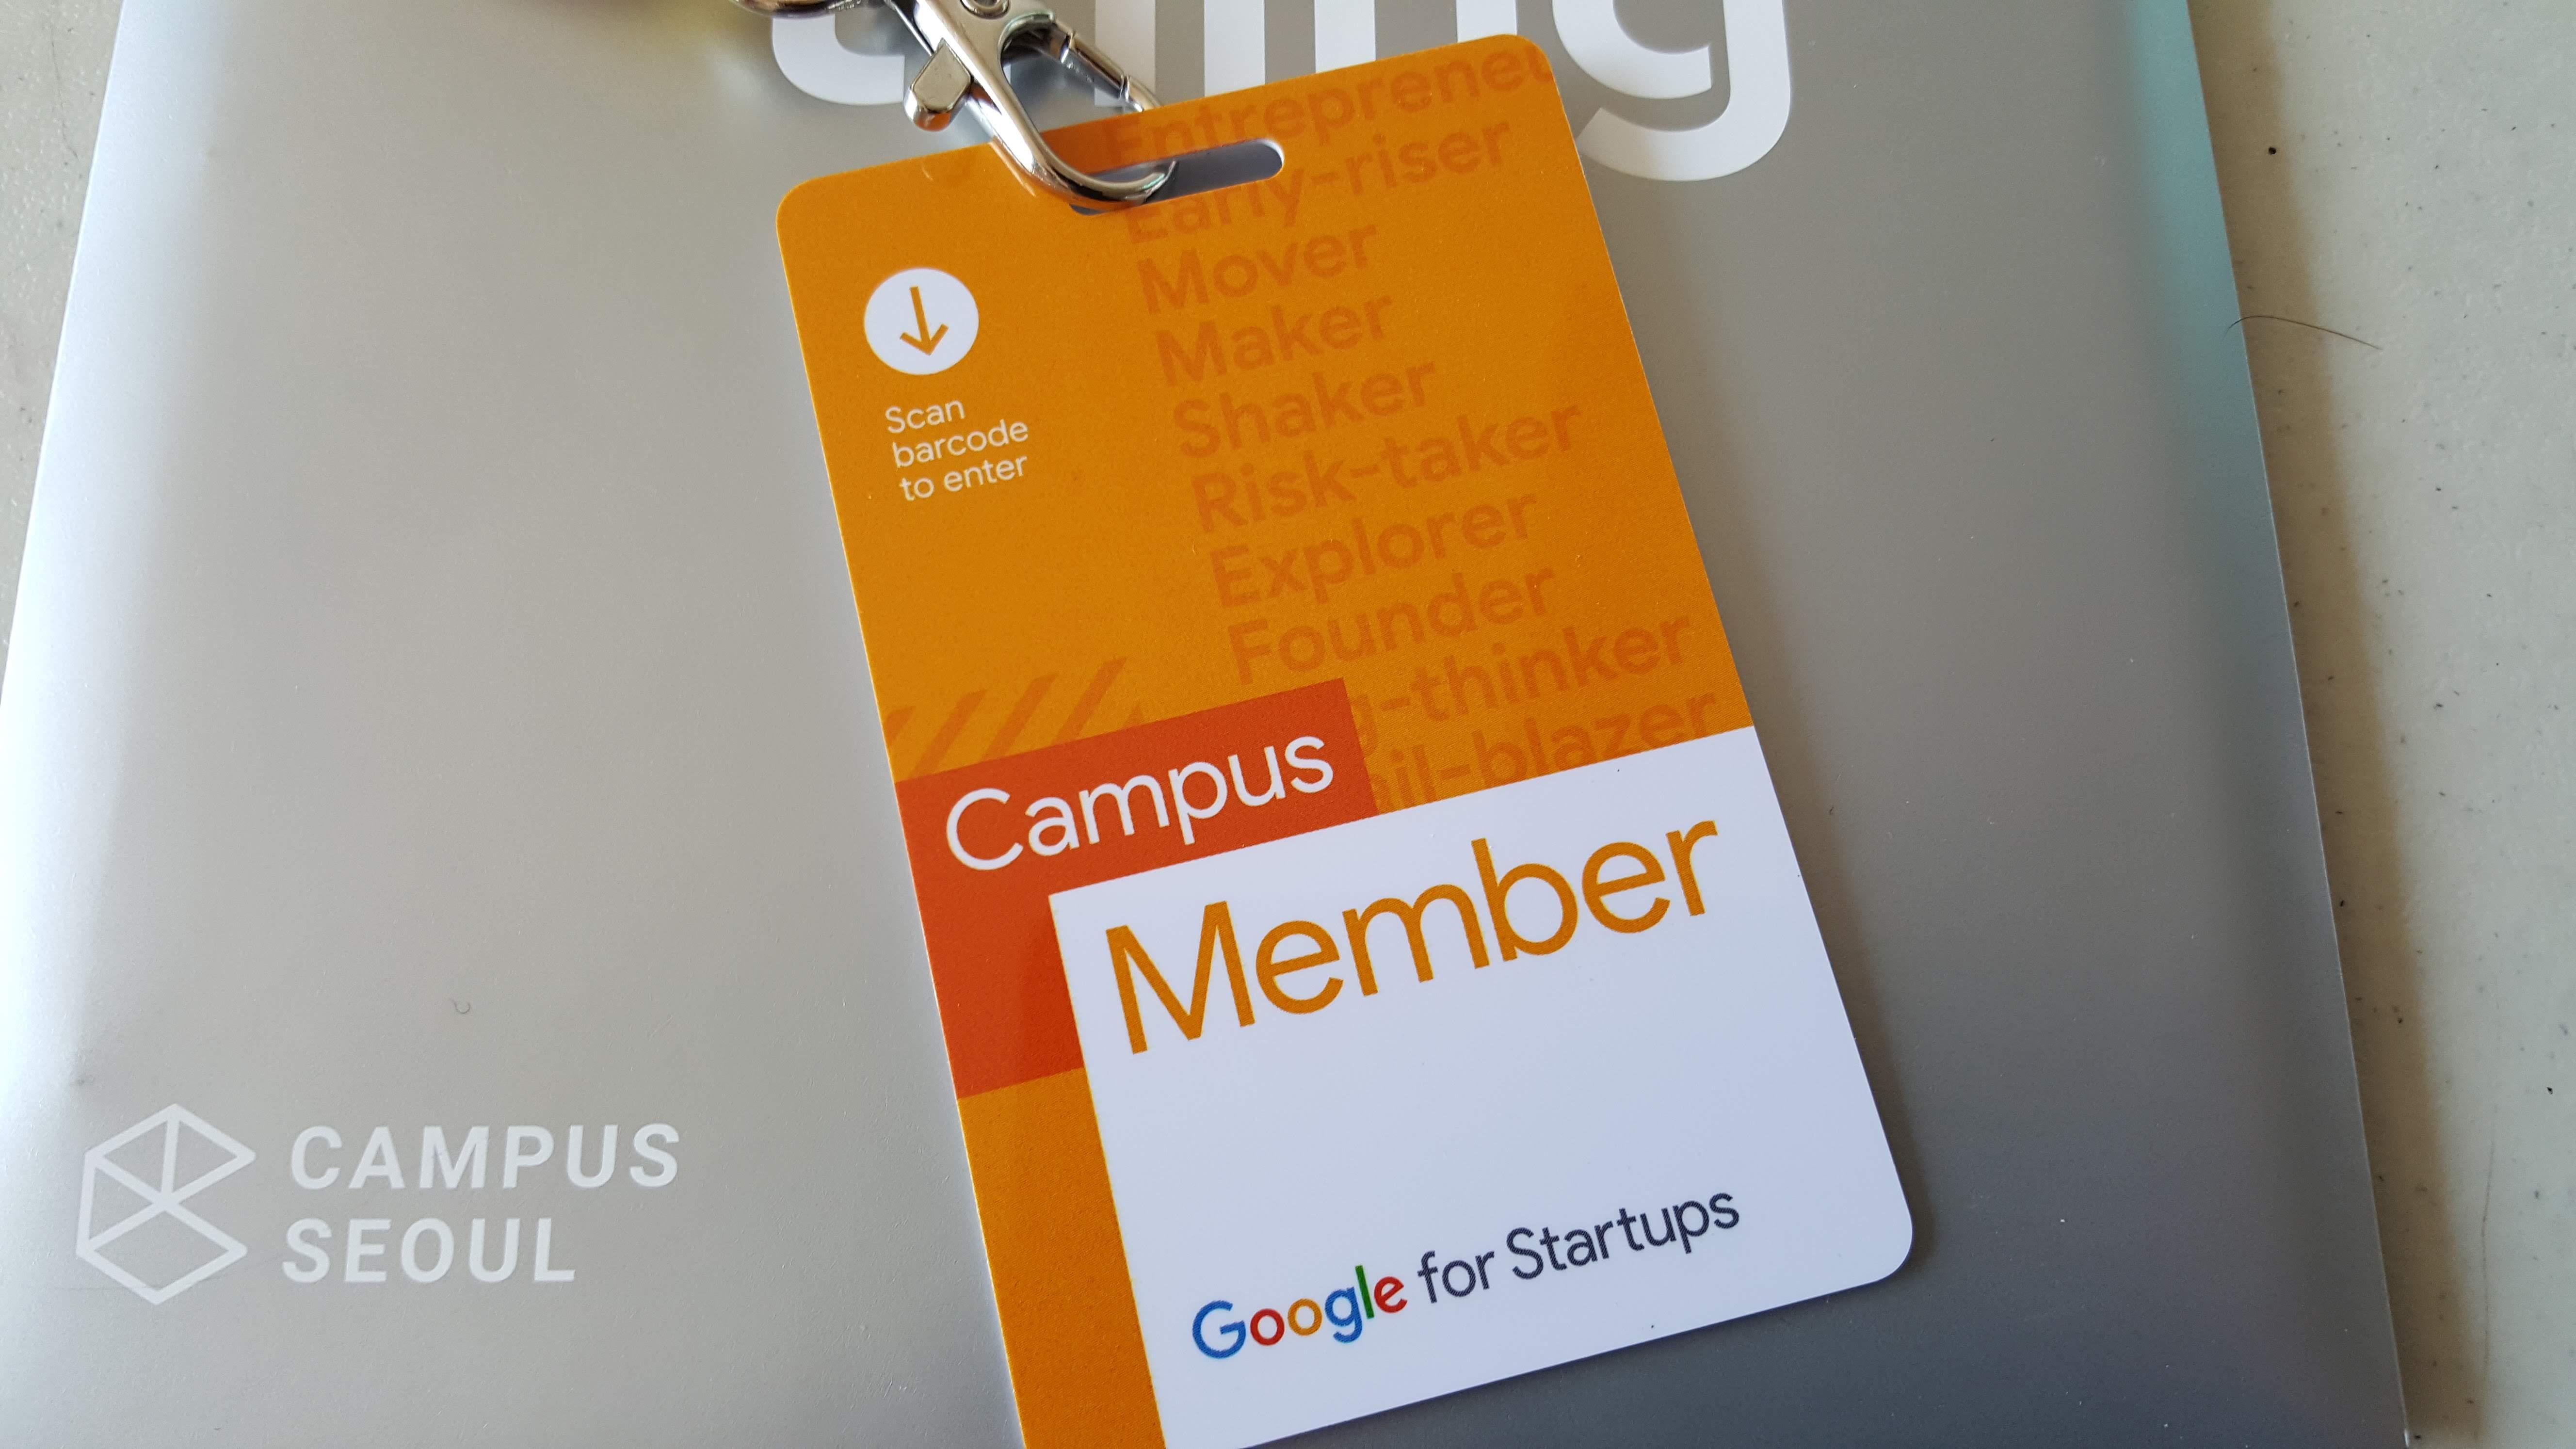 Google Campus SEOUL 합류 선물